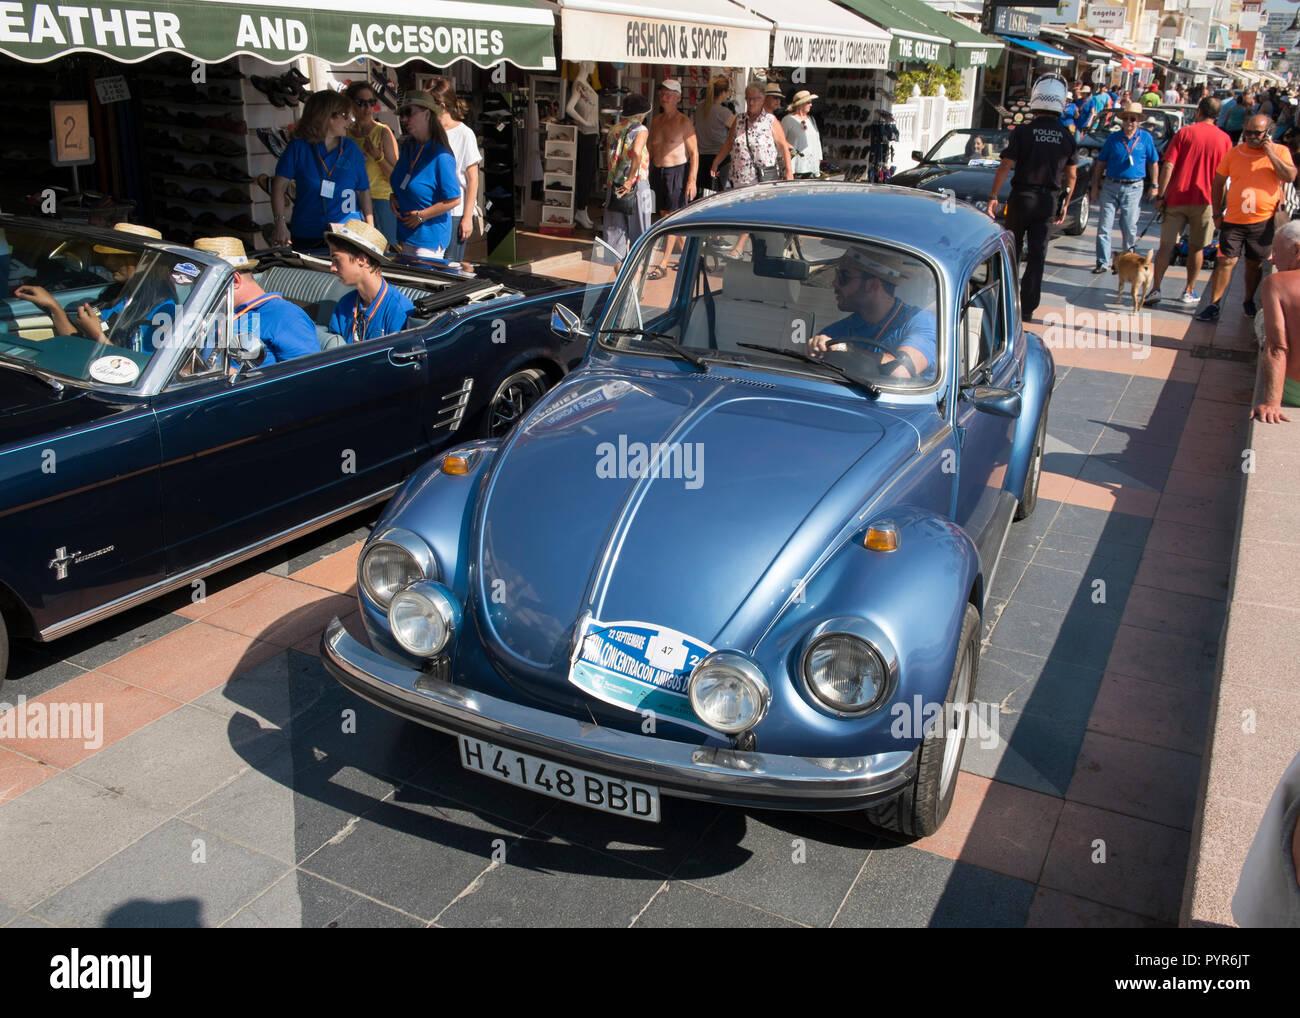 Classic Volkswagen Beetle. Classic car meeting in Torremolinos, Málaga, Spain. - Stock Image